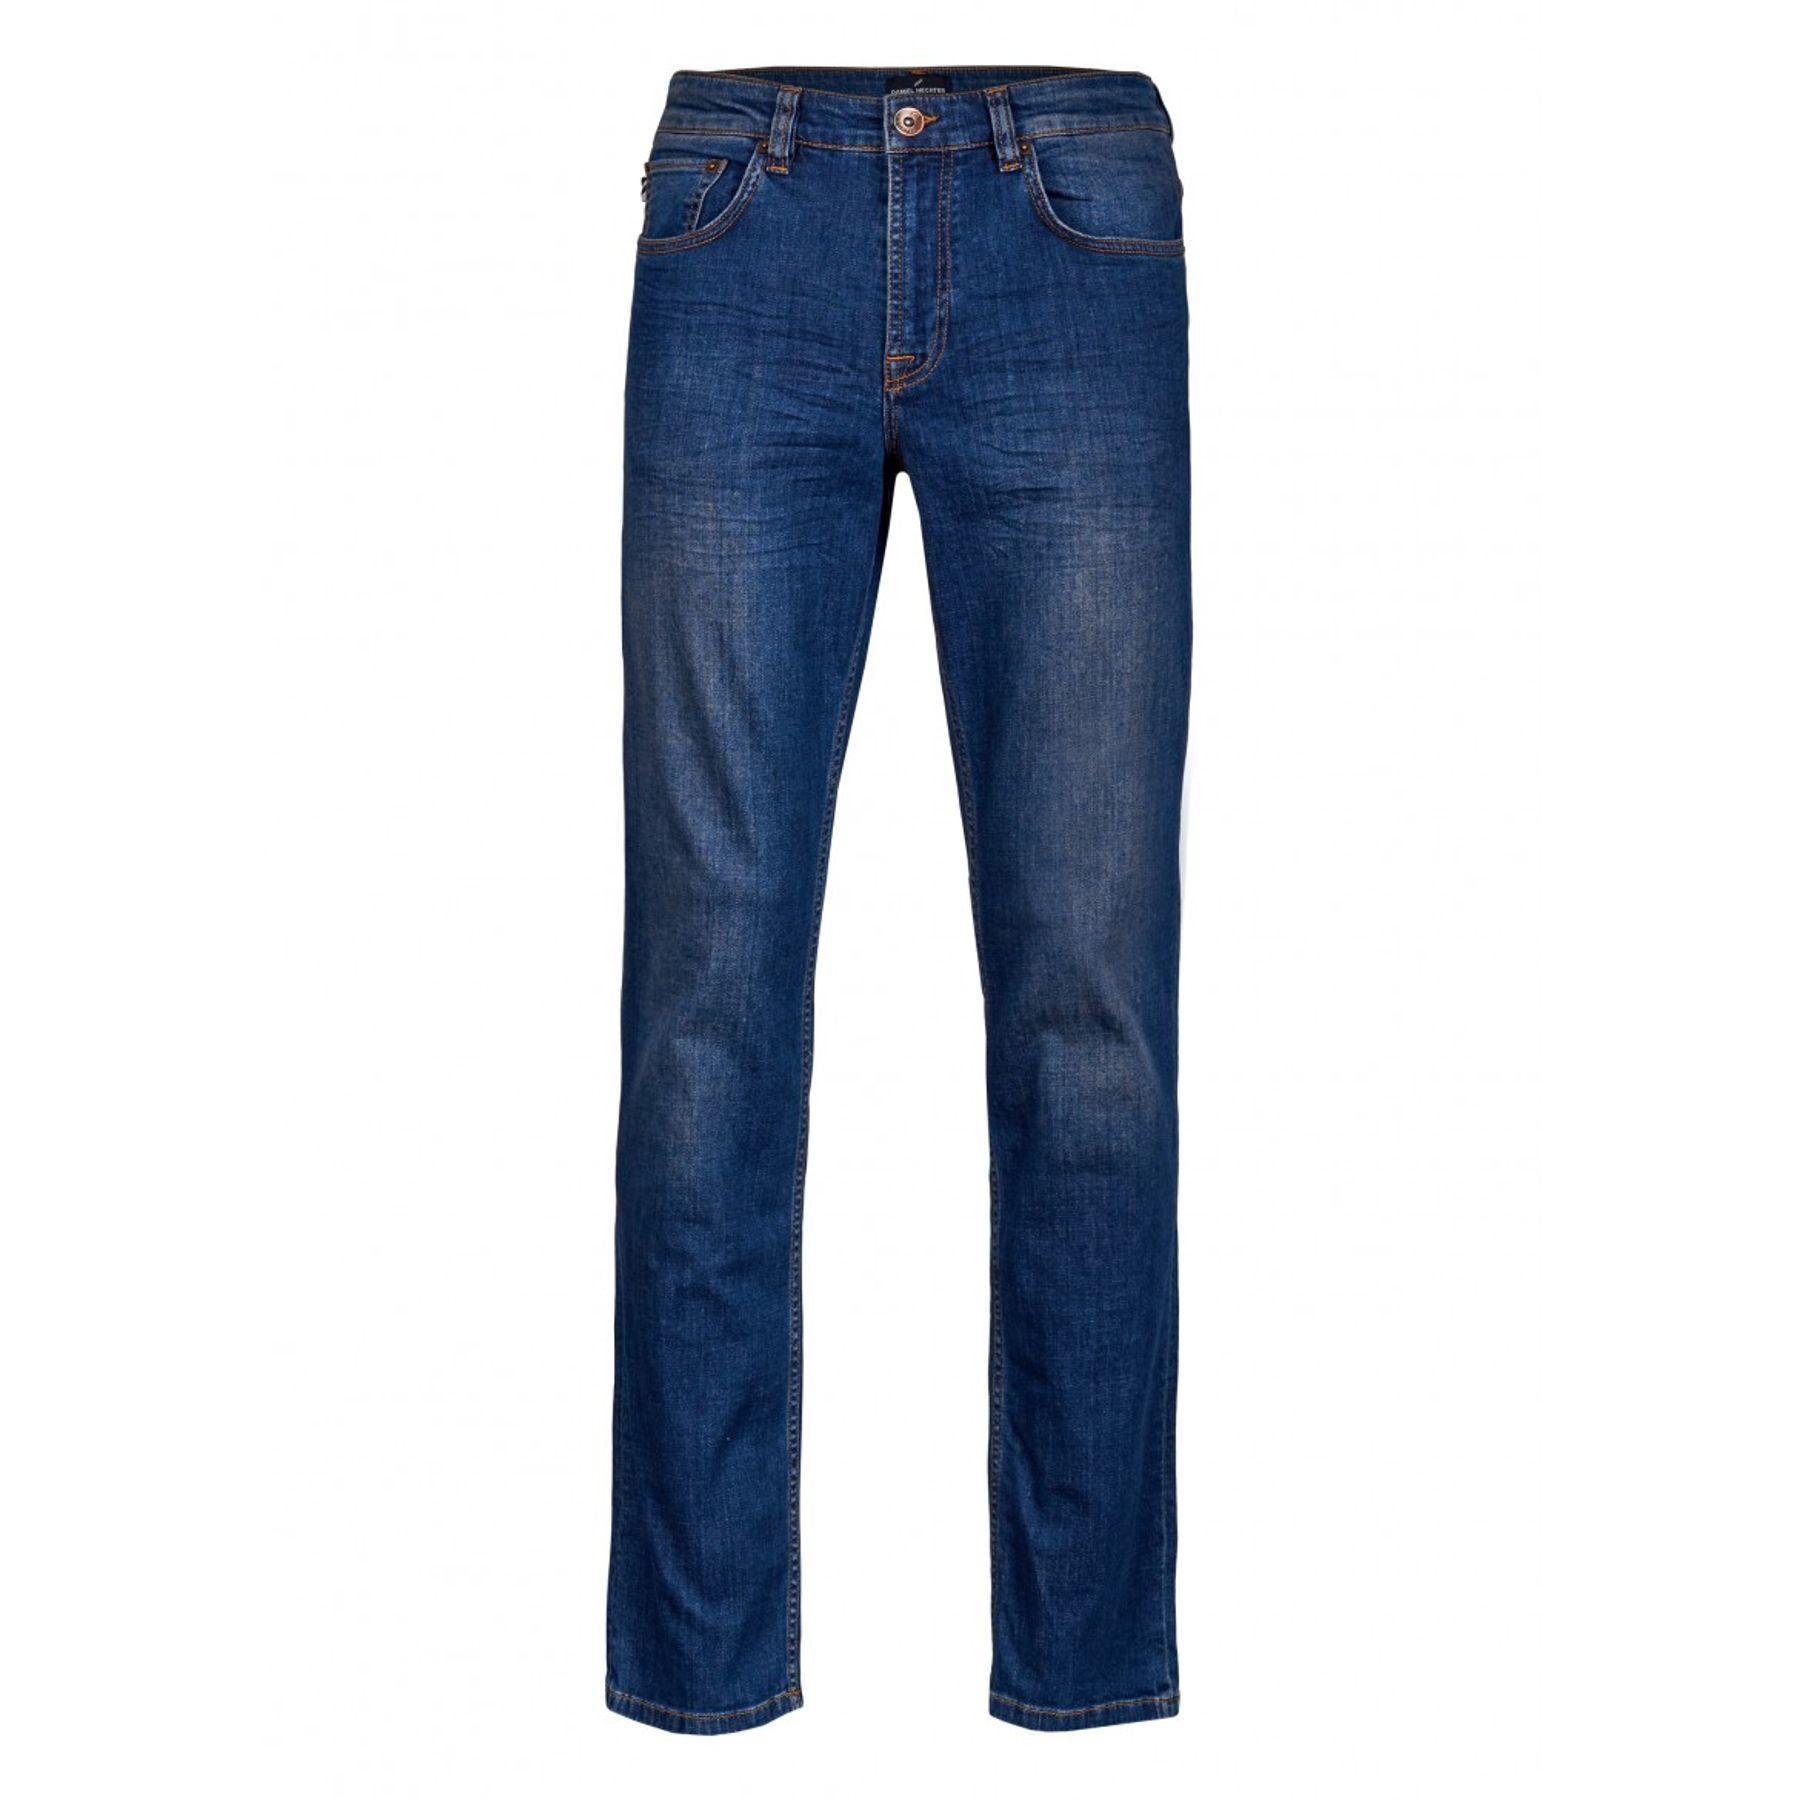 Daniel Hechter - Regular Comfort Fit - Herren 5-Pocket Jeans in Blau oder Dunkelblau (100350) – Bild 4